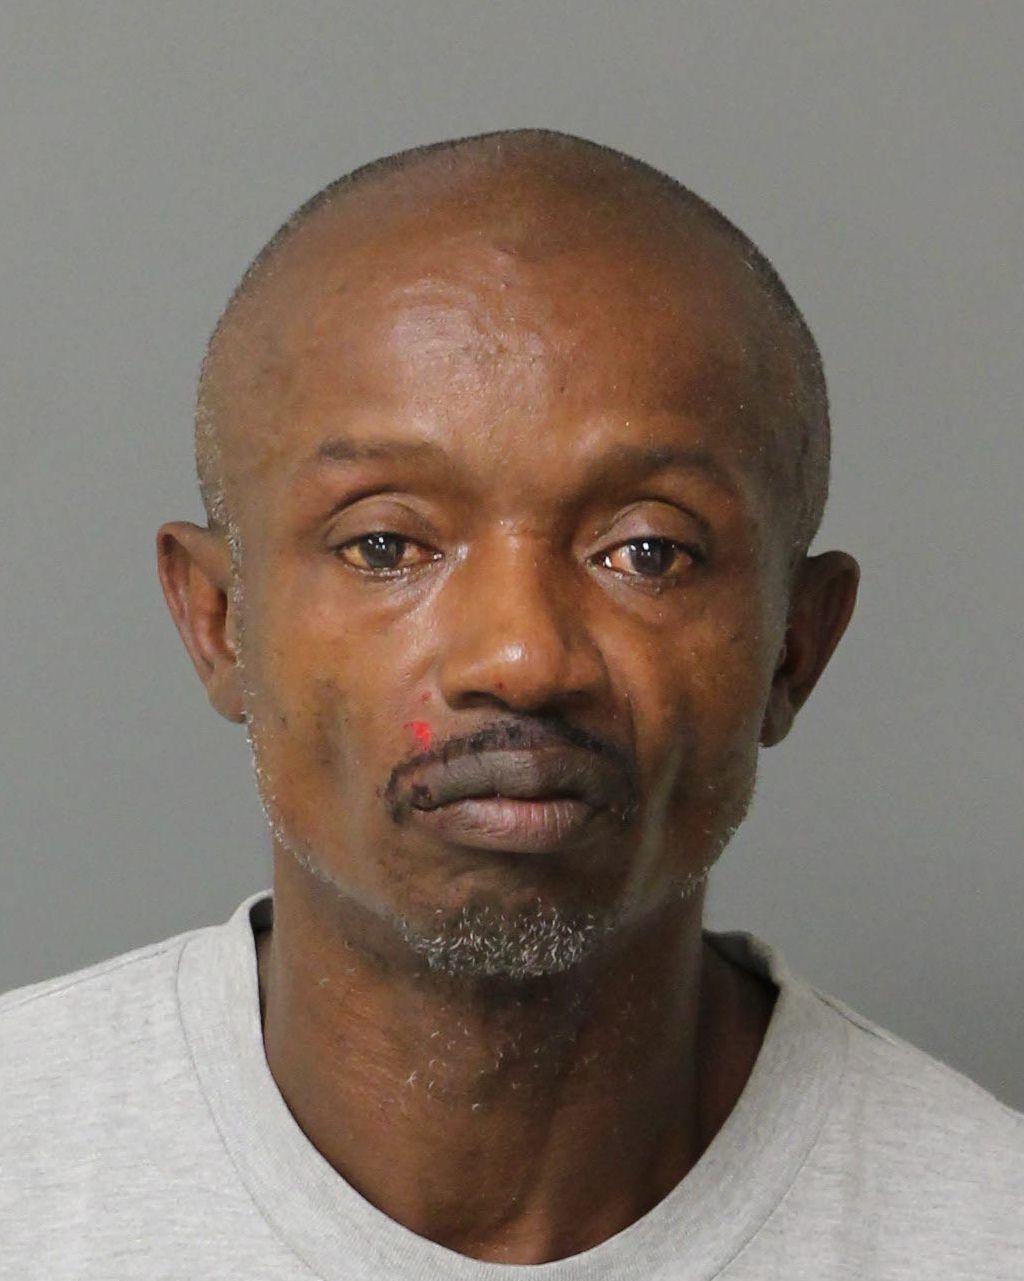 GENE LAMONT HILL Mugshot / County Arrests / Wake County Arrests